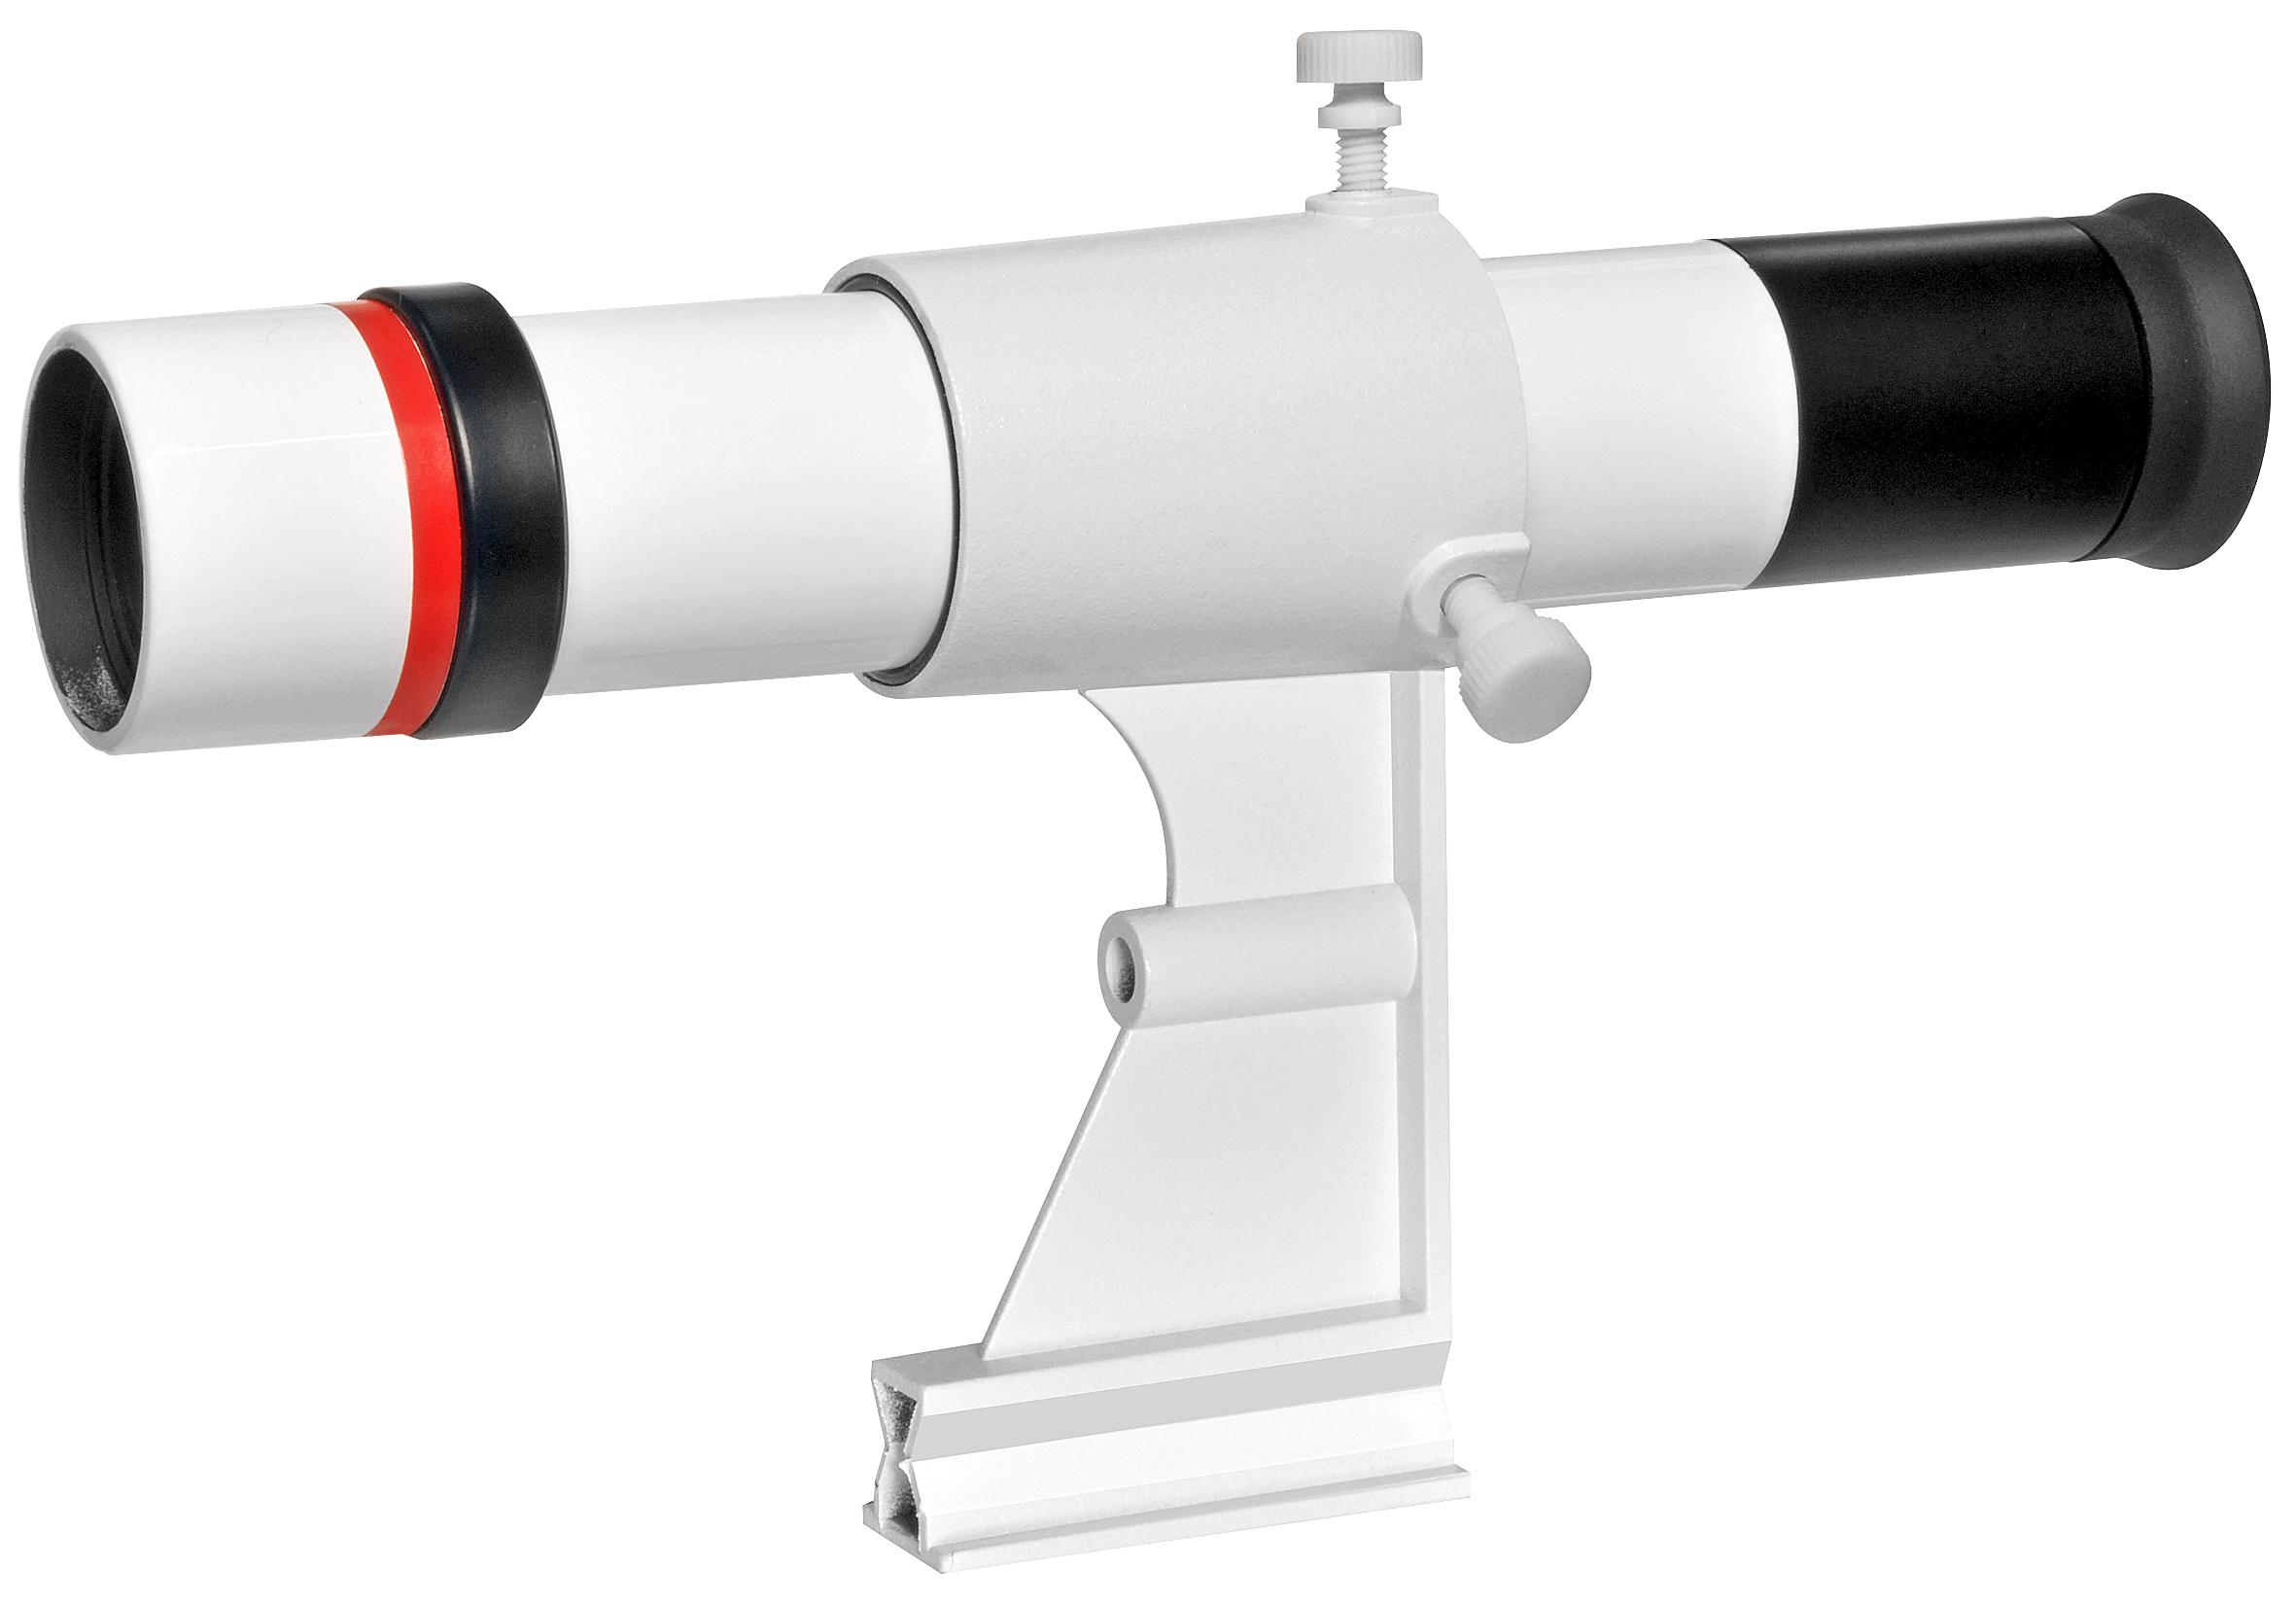 National geographic teleskop goto youtube